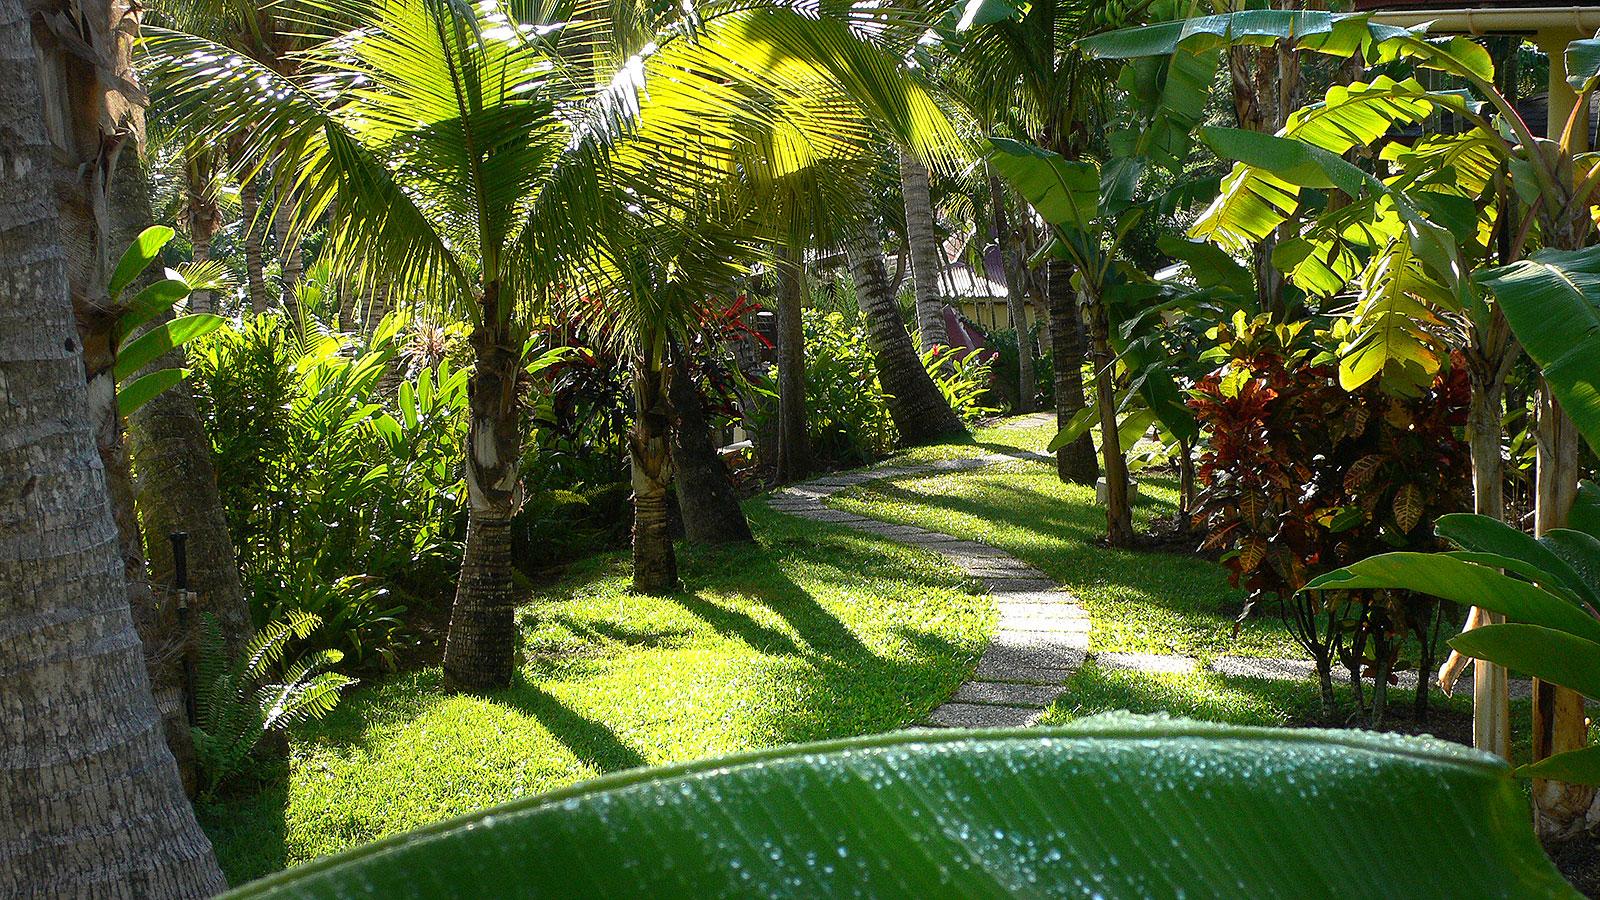 Habitation grande anse for Jardin botanique guadeloupe